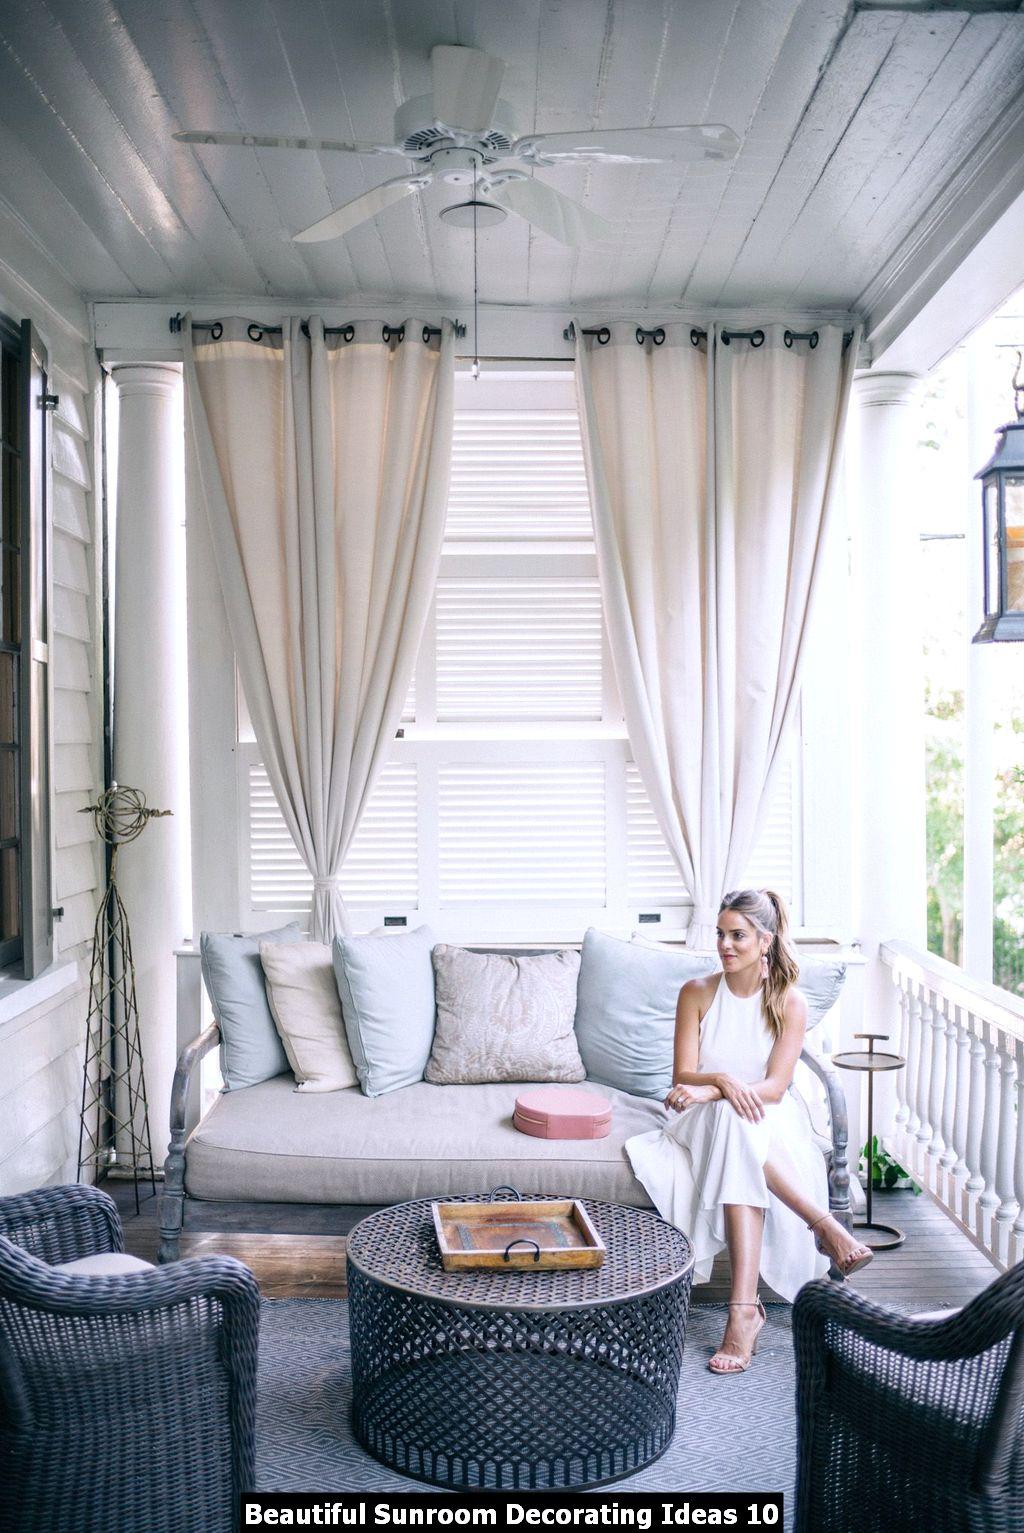 Beautiful Sunroom Decorating Ideas 10